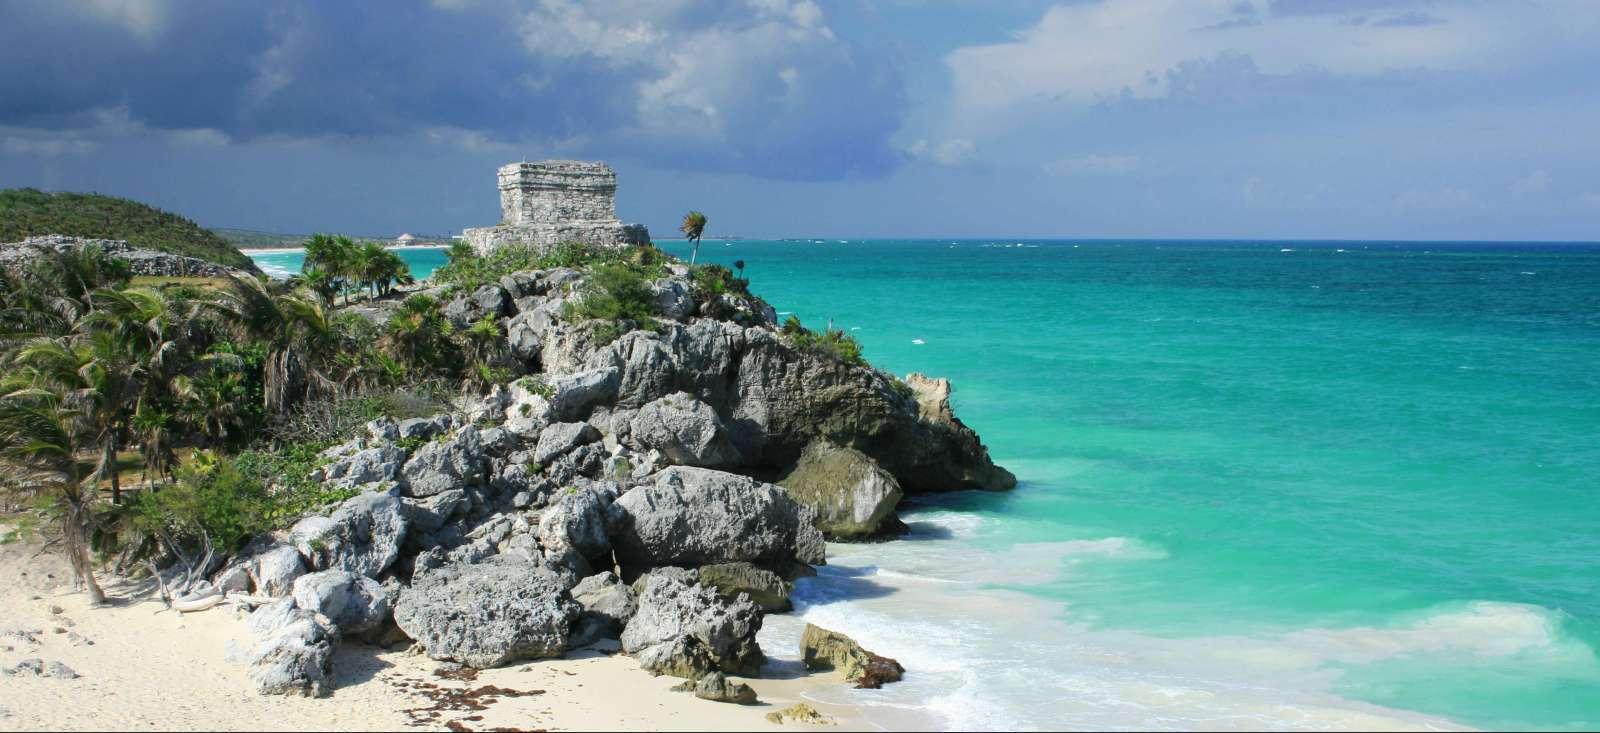 Voyage à pied : Escapade Maya et péninsule du Yucatan